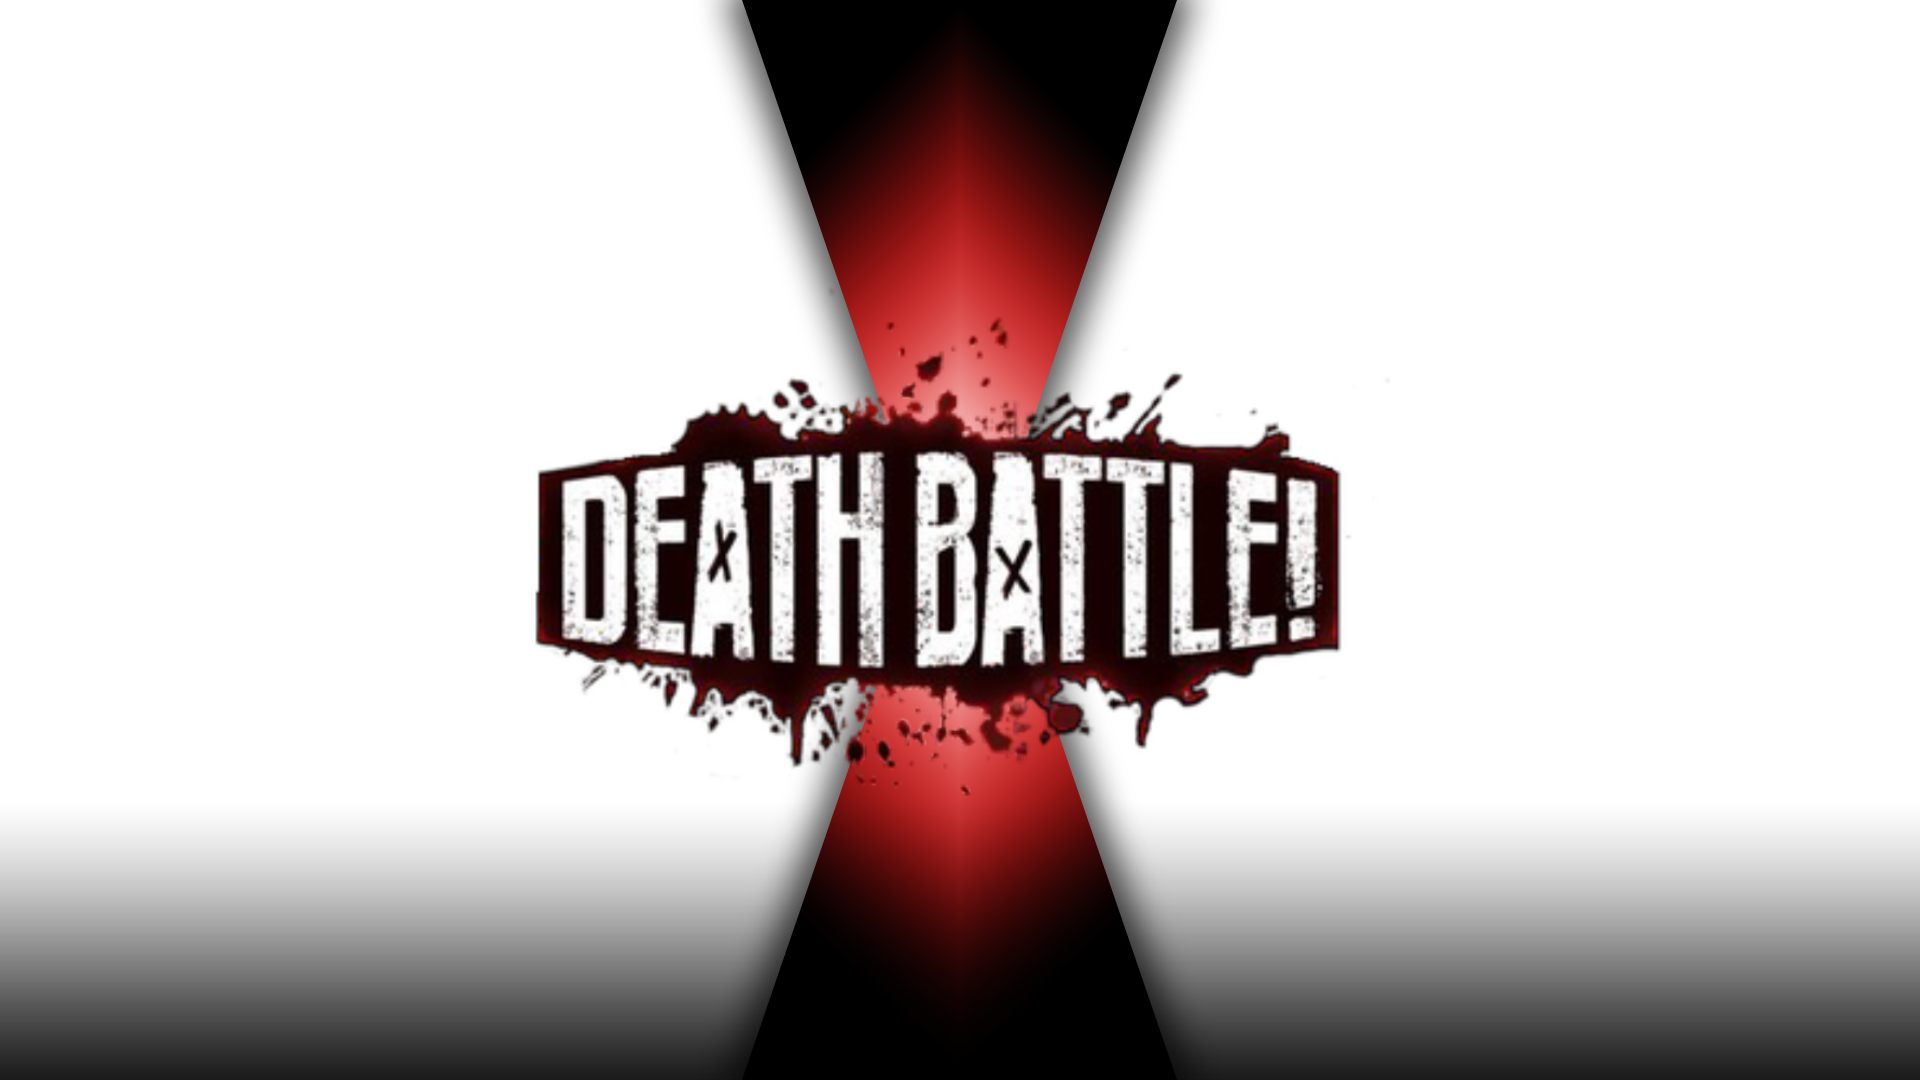 Image 1DB Template Shadow.png | DEATH BATTLE Wiki | FANDOM